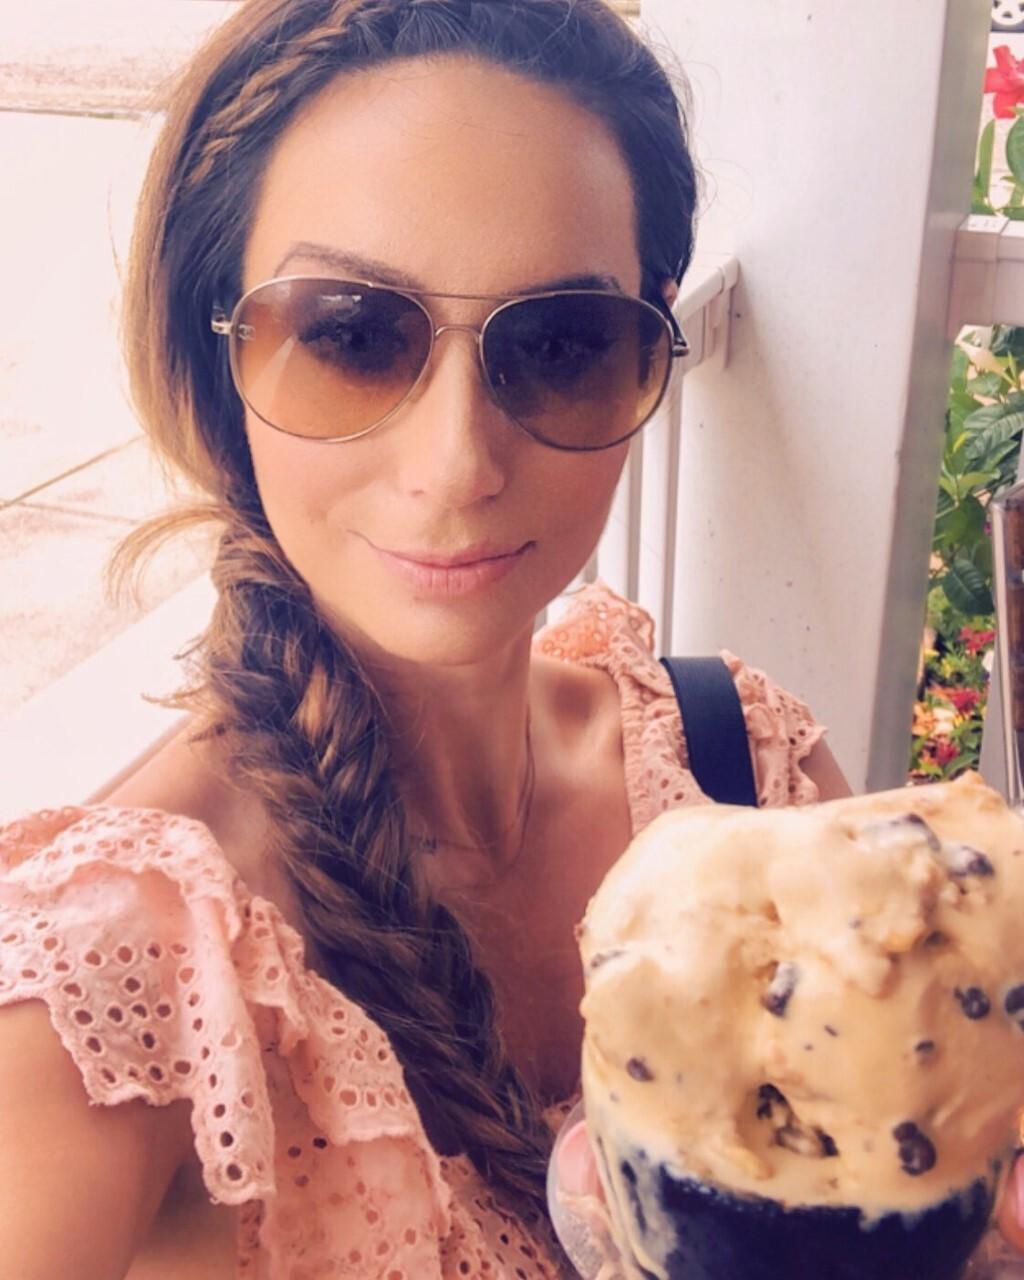 sabrina fein ice cream.jpg